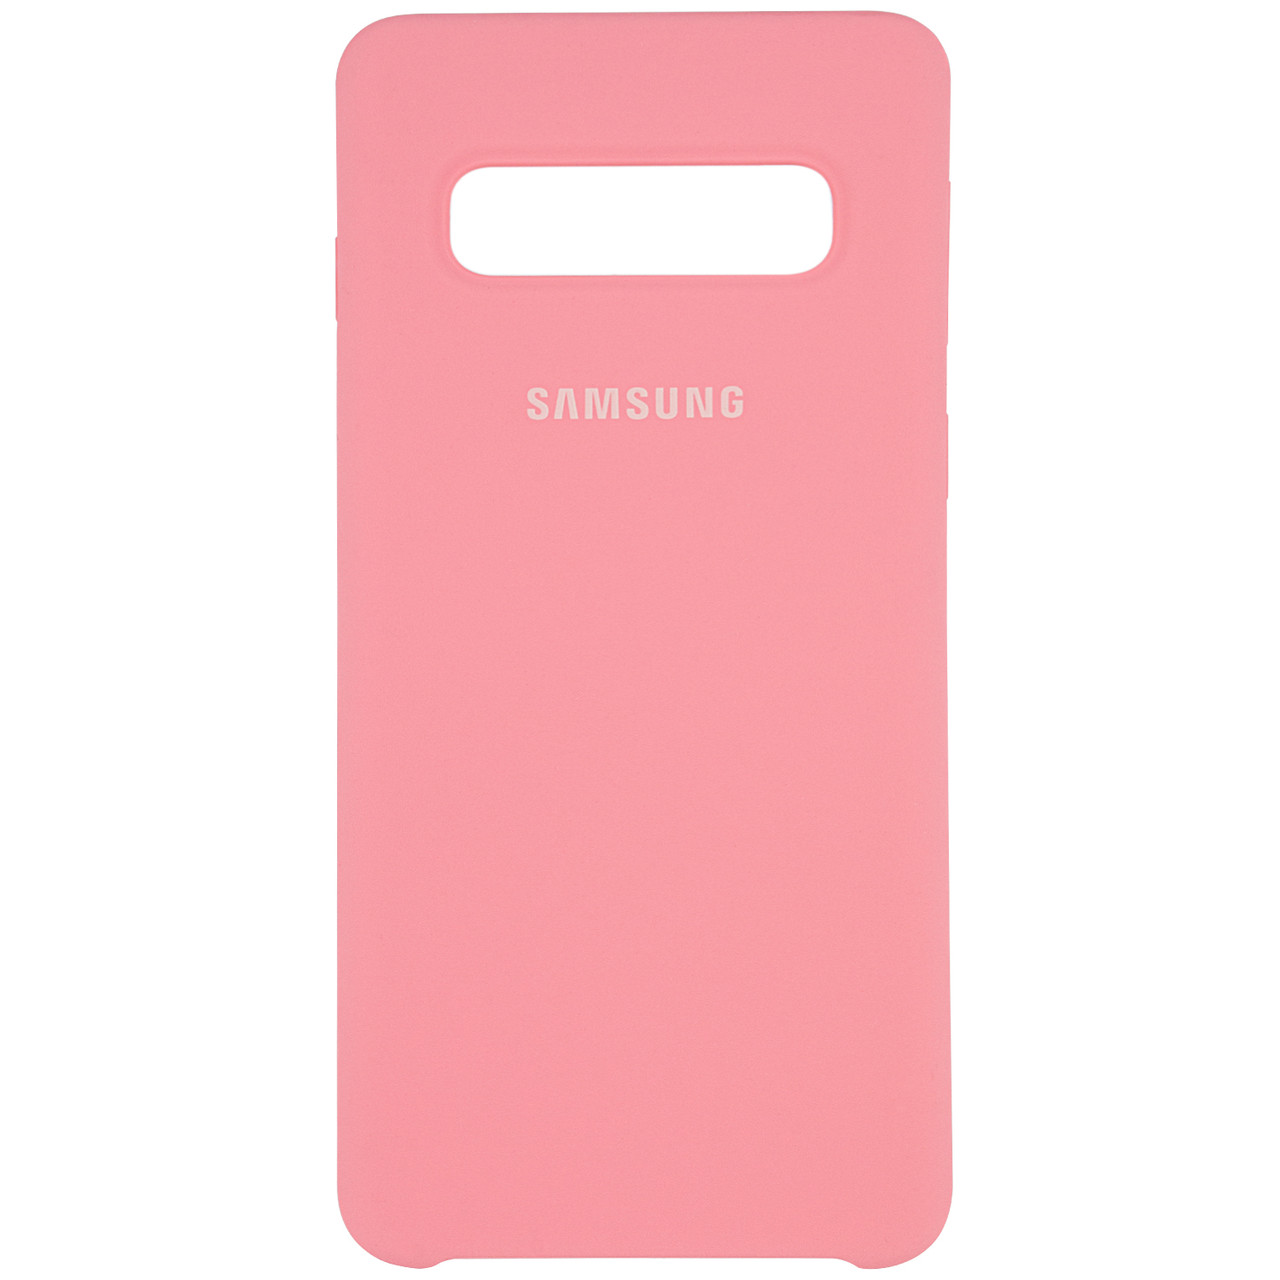 Чехол Silicone case для Samsung Galaxy S10+